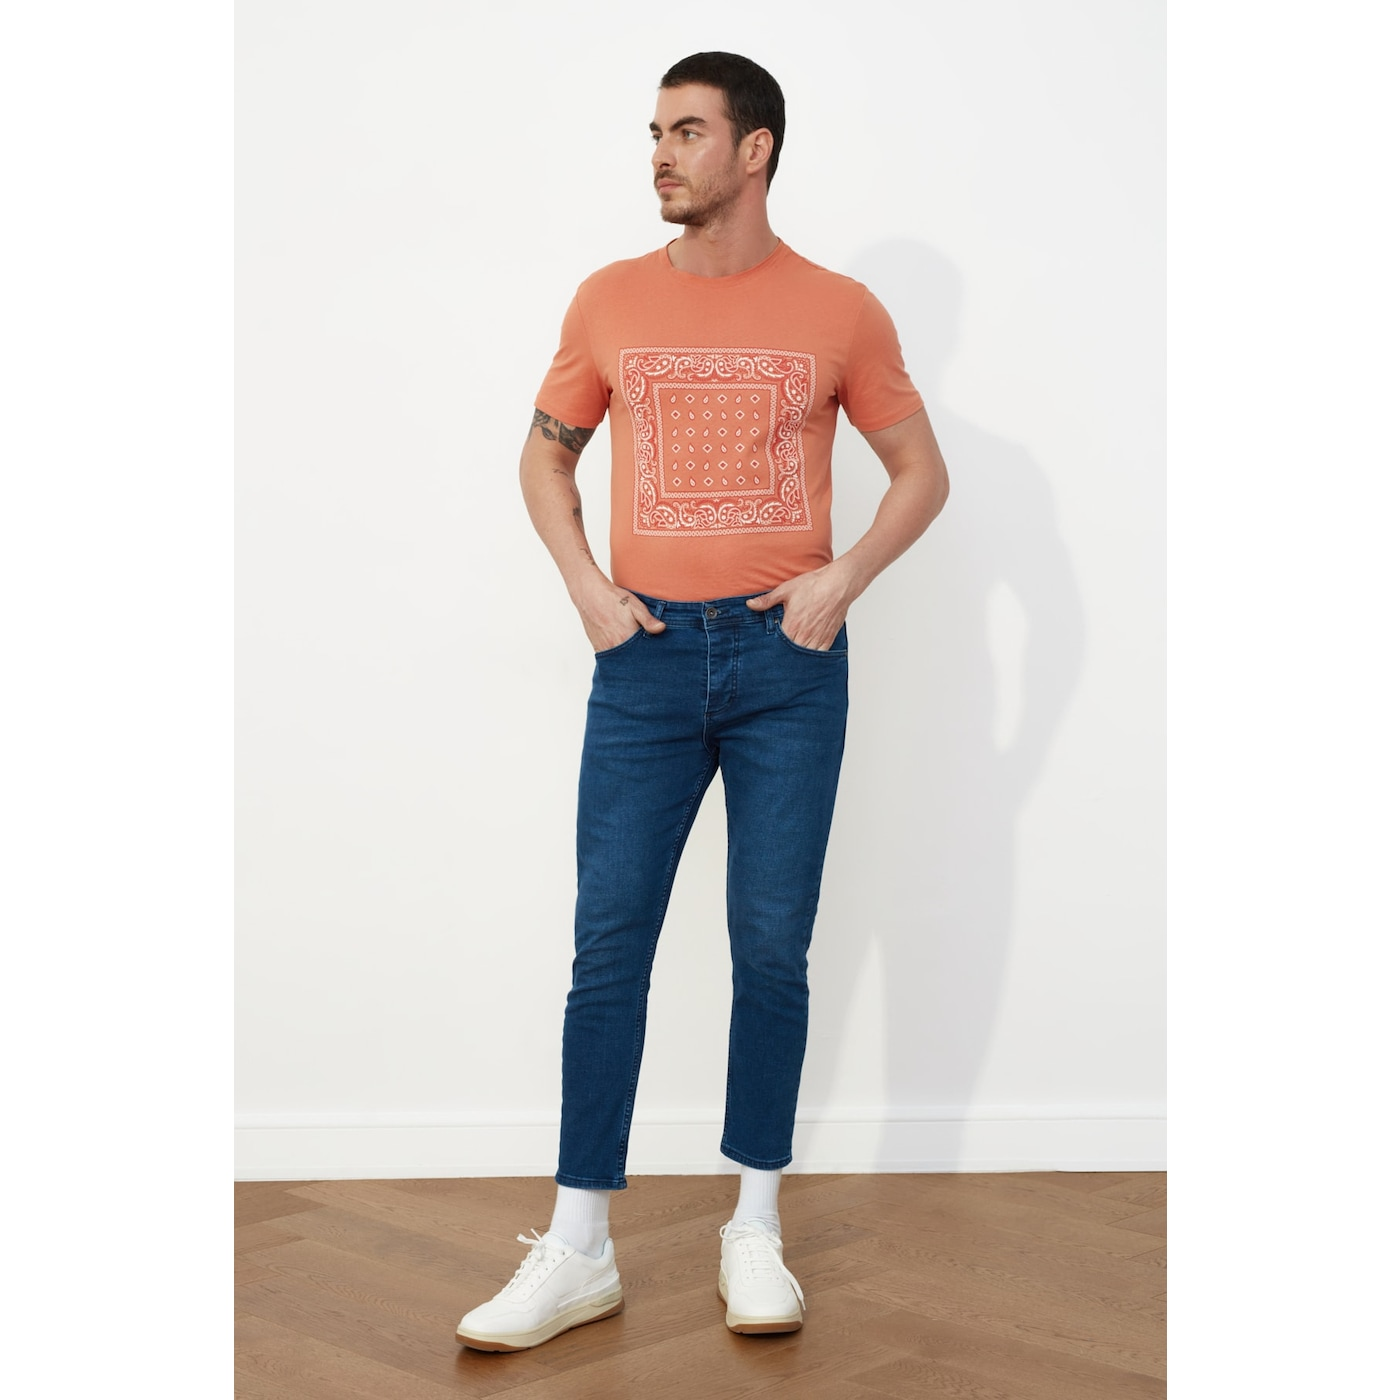 Trendyol Outdoor Navy Blue Male Skinny Crop Jeans AÇIK LACİVERT 30